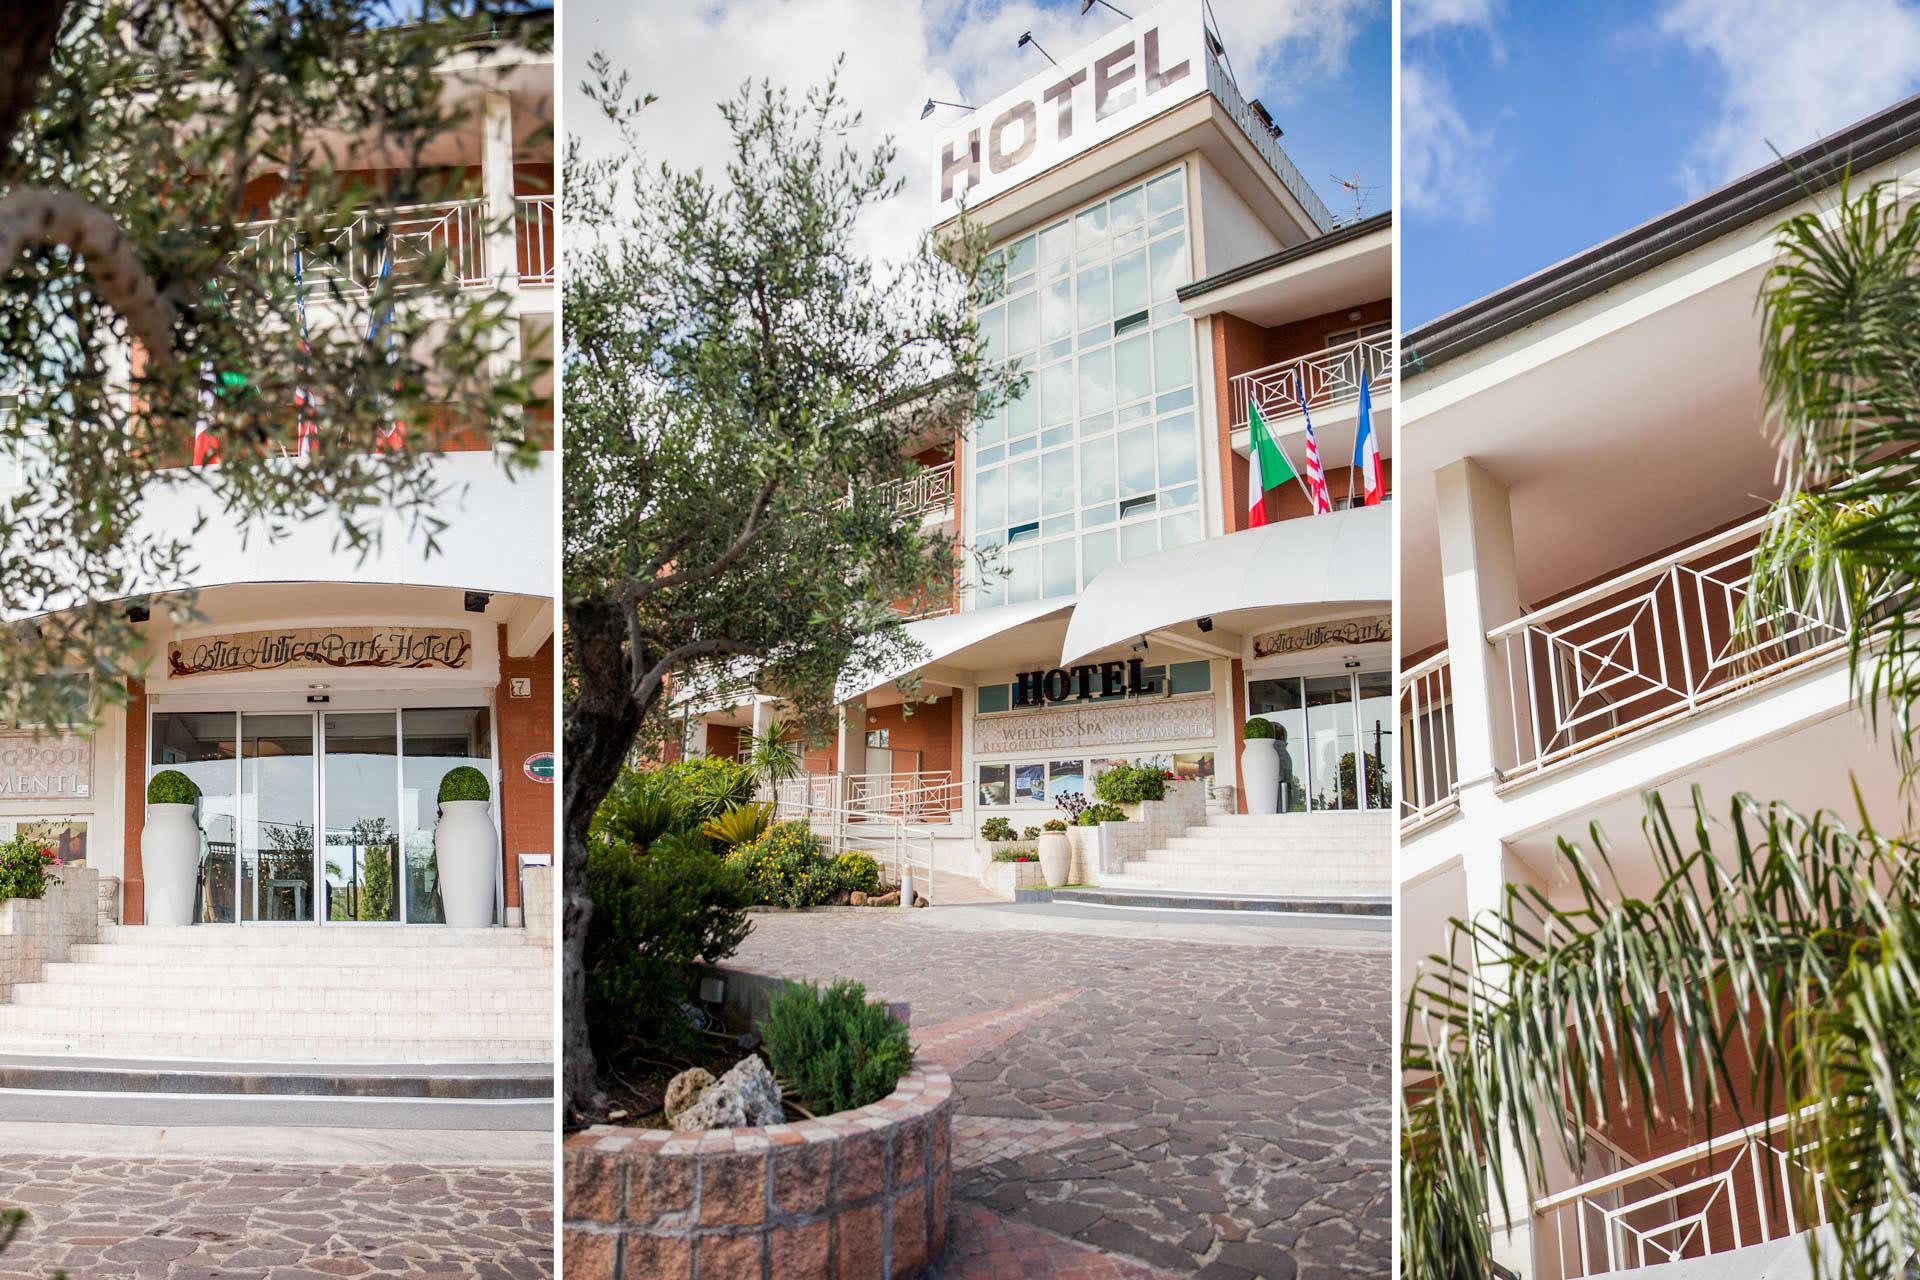 Baño Turco Traduccion:Ostia Hotel cerca de Feria Roma Fiumicino Aeropuerto Hoteles Piscina